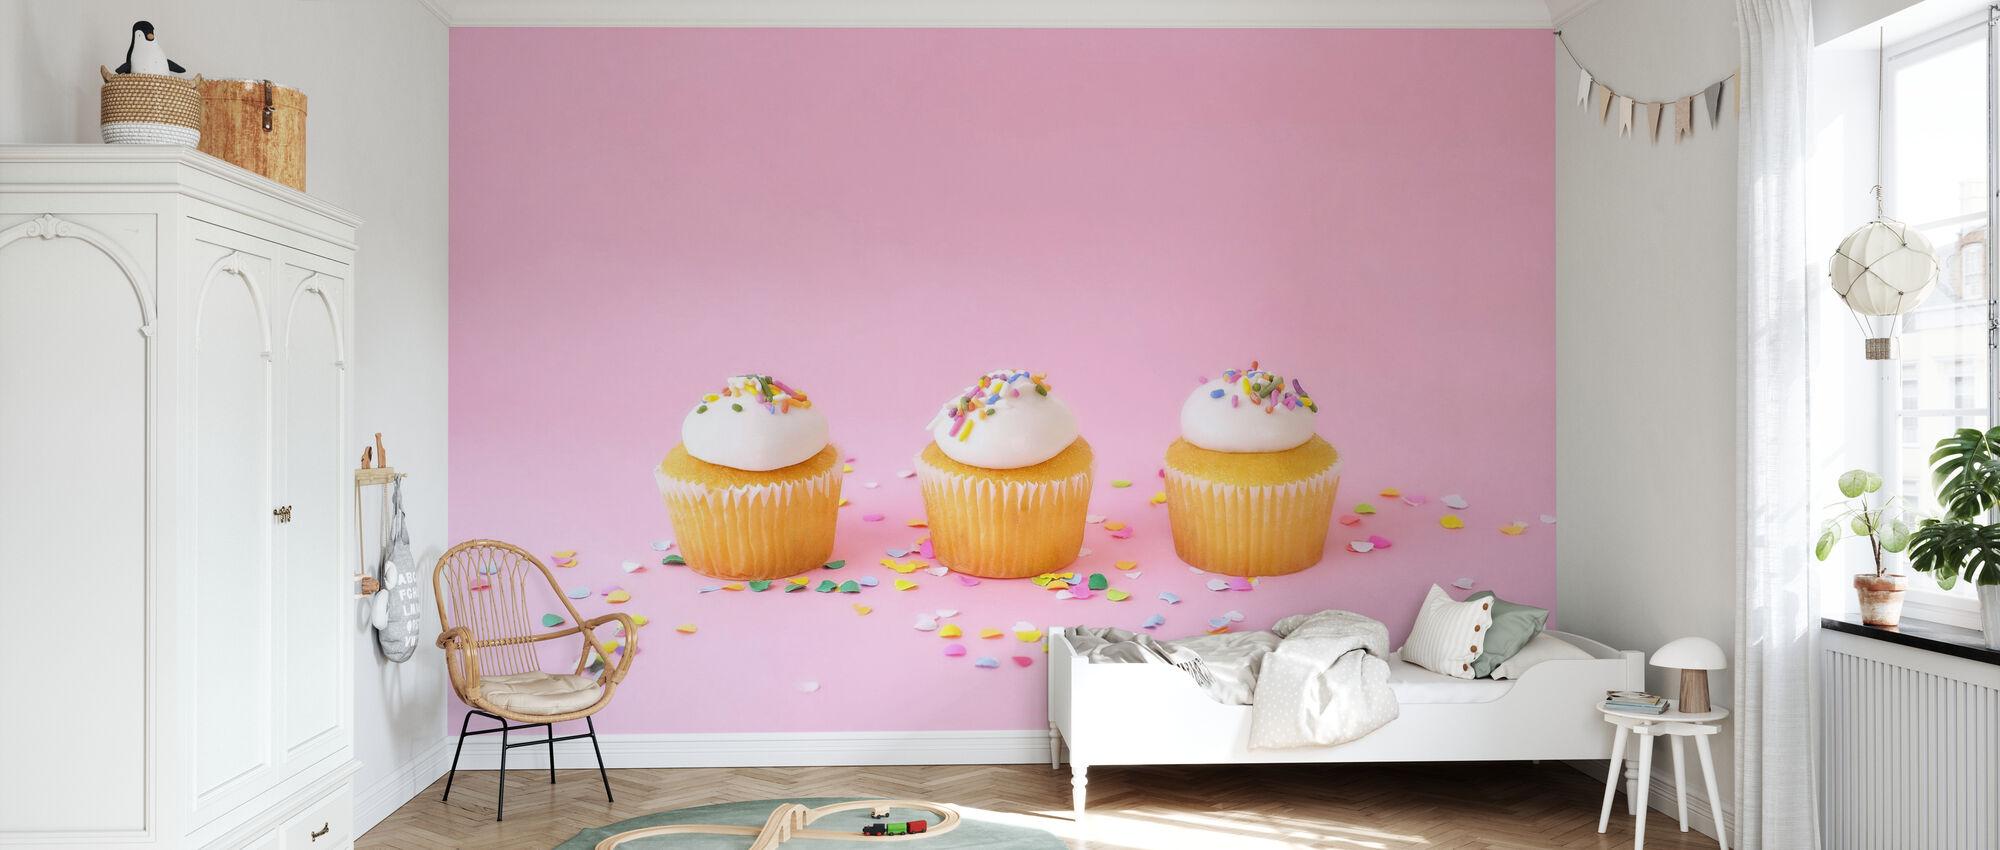 Matt Cupcakes - Tapete - Kinderzimmer